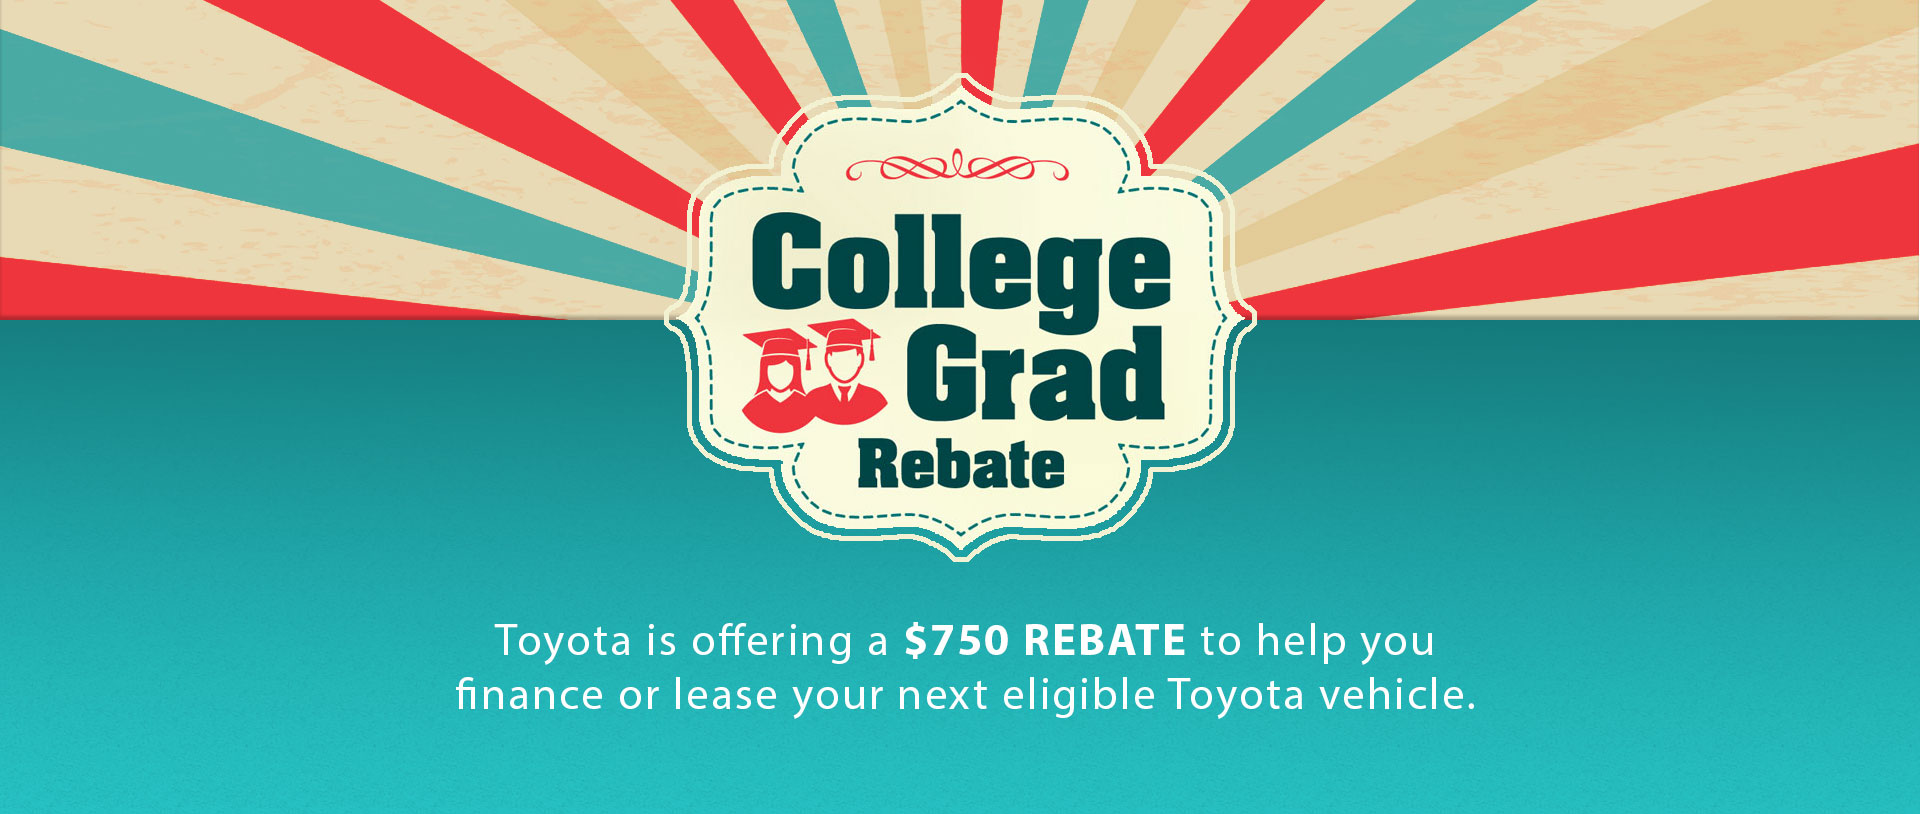 college-grad-rebate-toyota